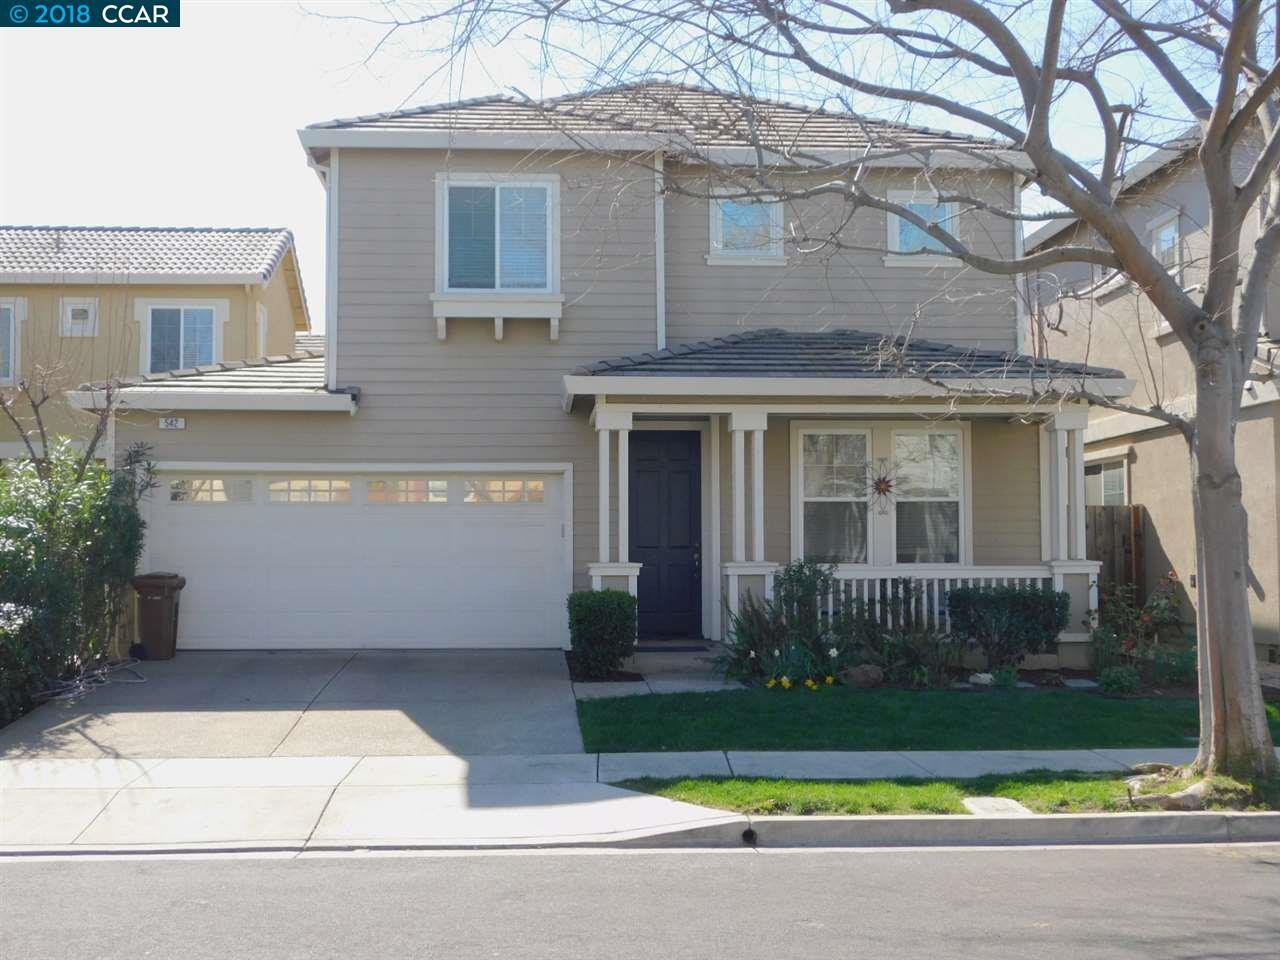 542 Almanor St, BRENTWOOD, CA 94513